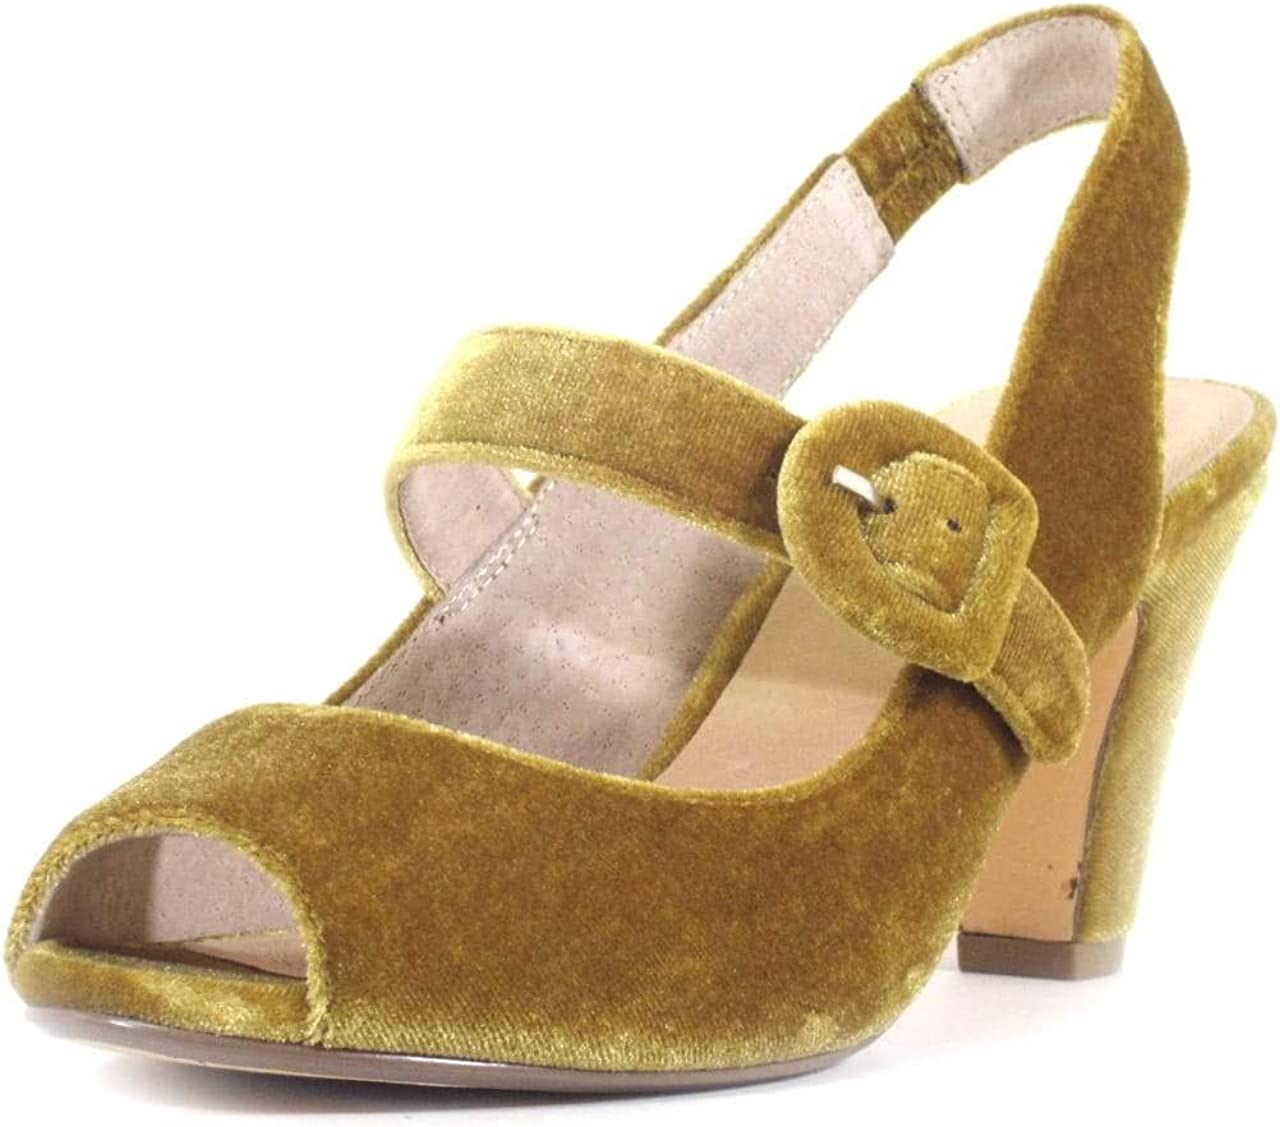 70s Shoes, Platforms, Boots, Heels | 1970s Shoes Chelsea Crew Liberty Womens Velvet Heels  AT vintagedancer.com